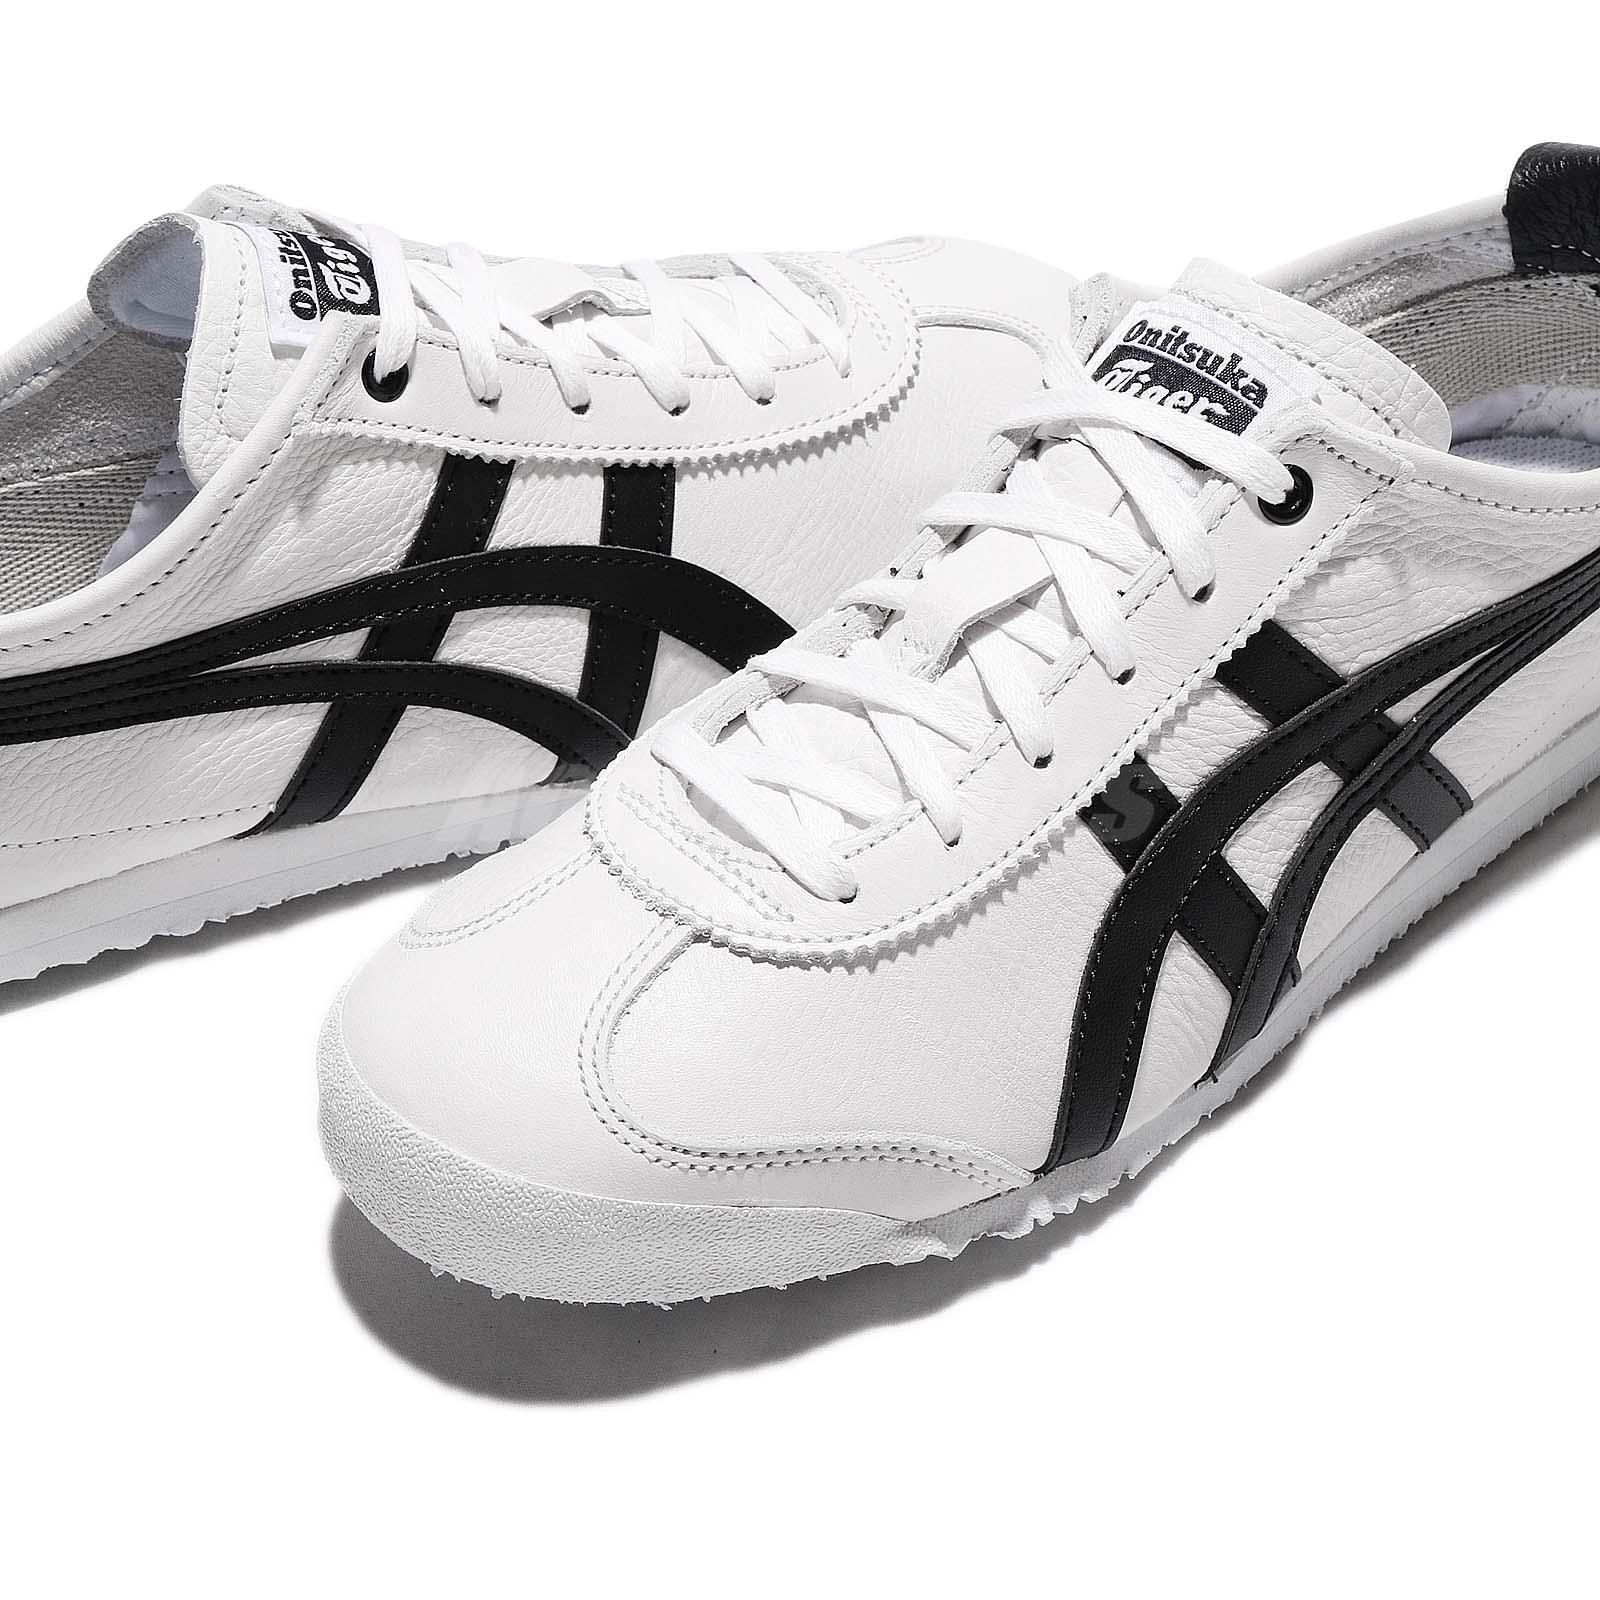 abc5a9c71a5 Asics Onitsuka Tiger Mexico 66 White Black Leather Men Classic Shoes ...